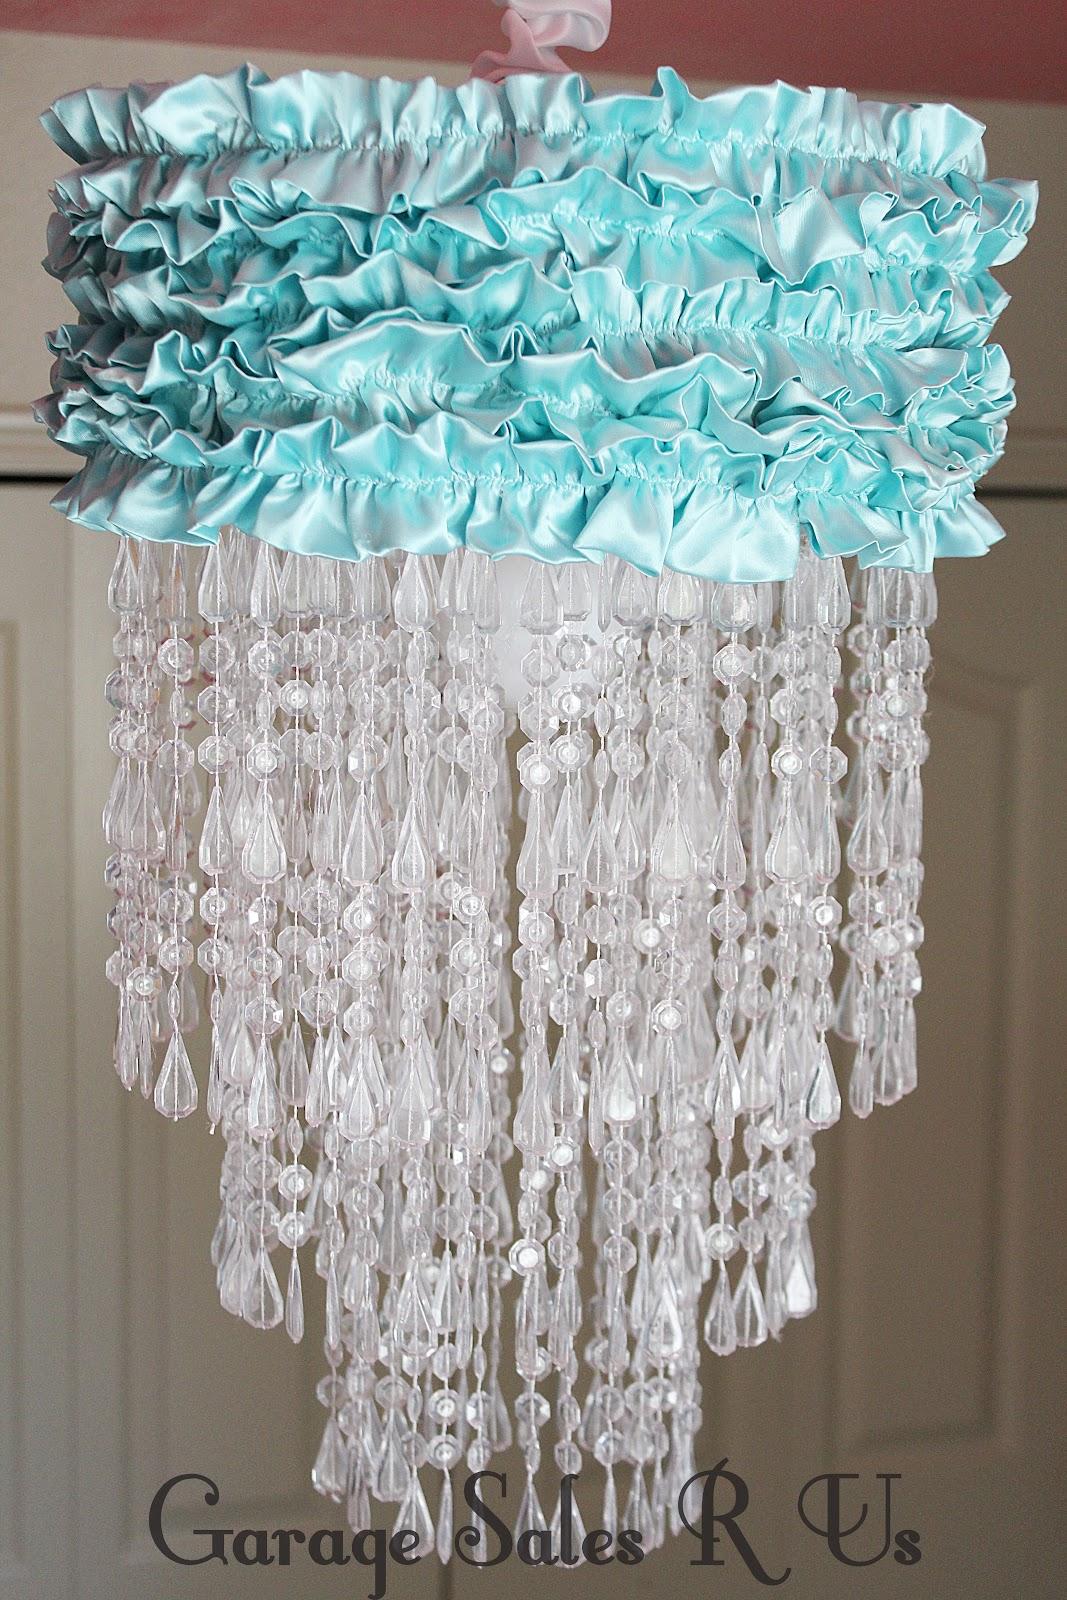 Garage sales r us diy chandelier img8663g mozeypictures Gallery